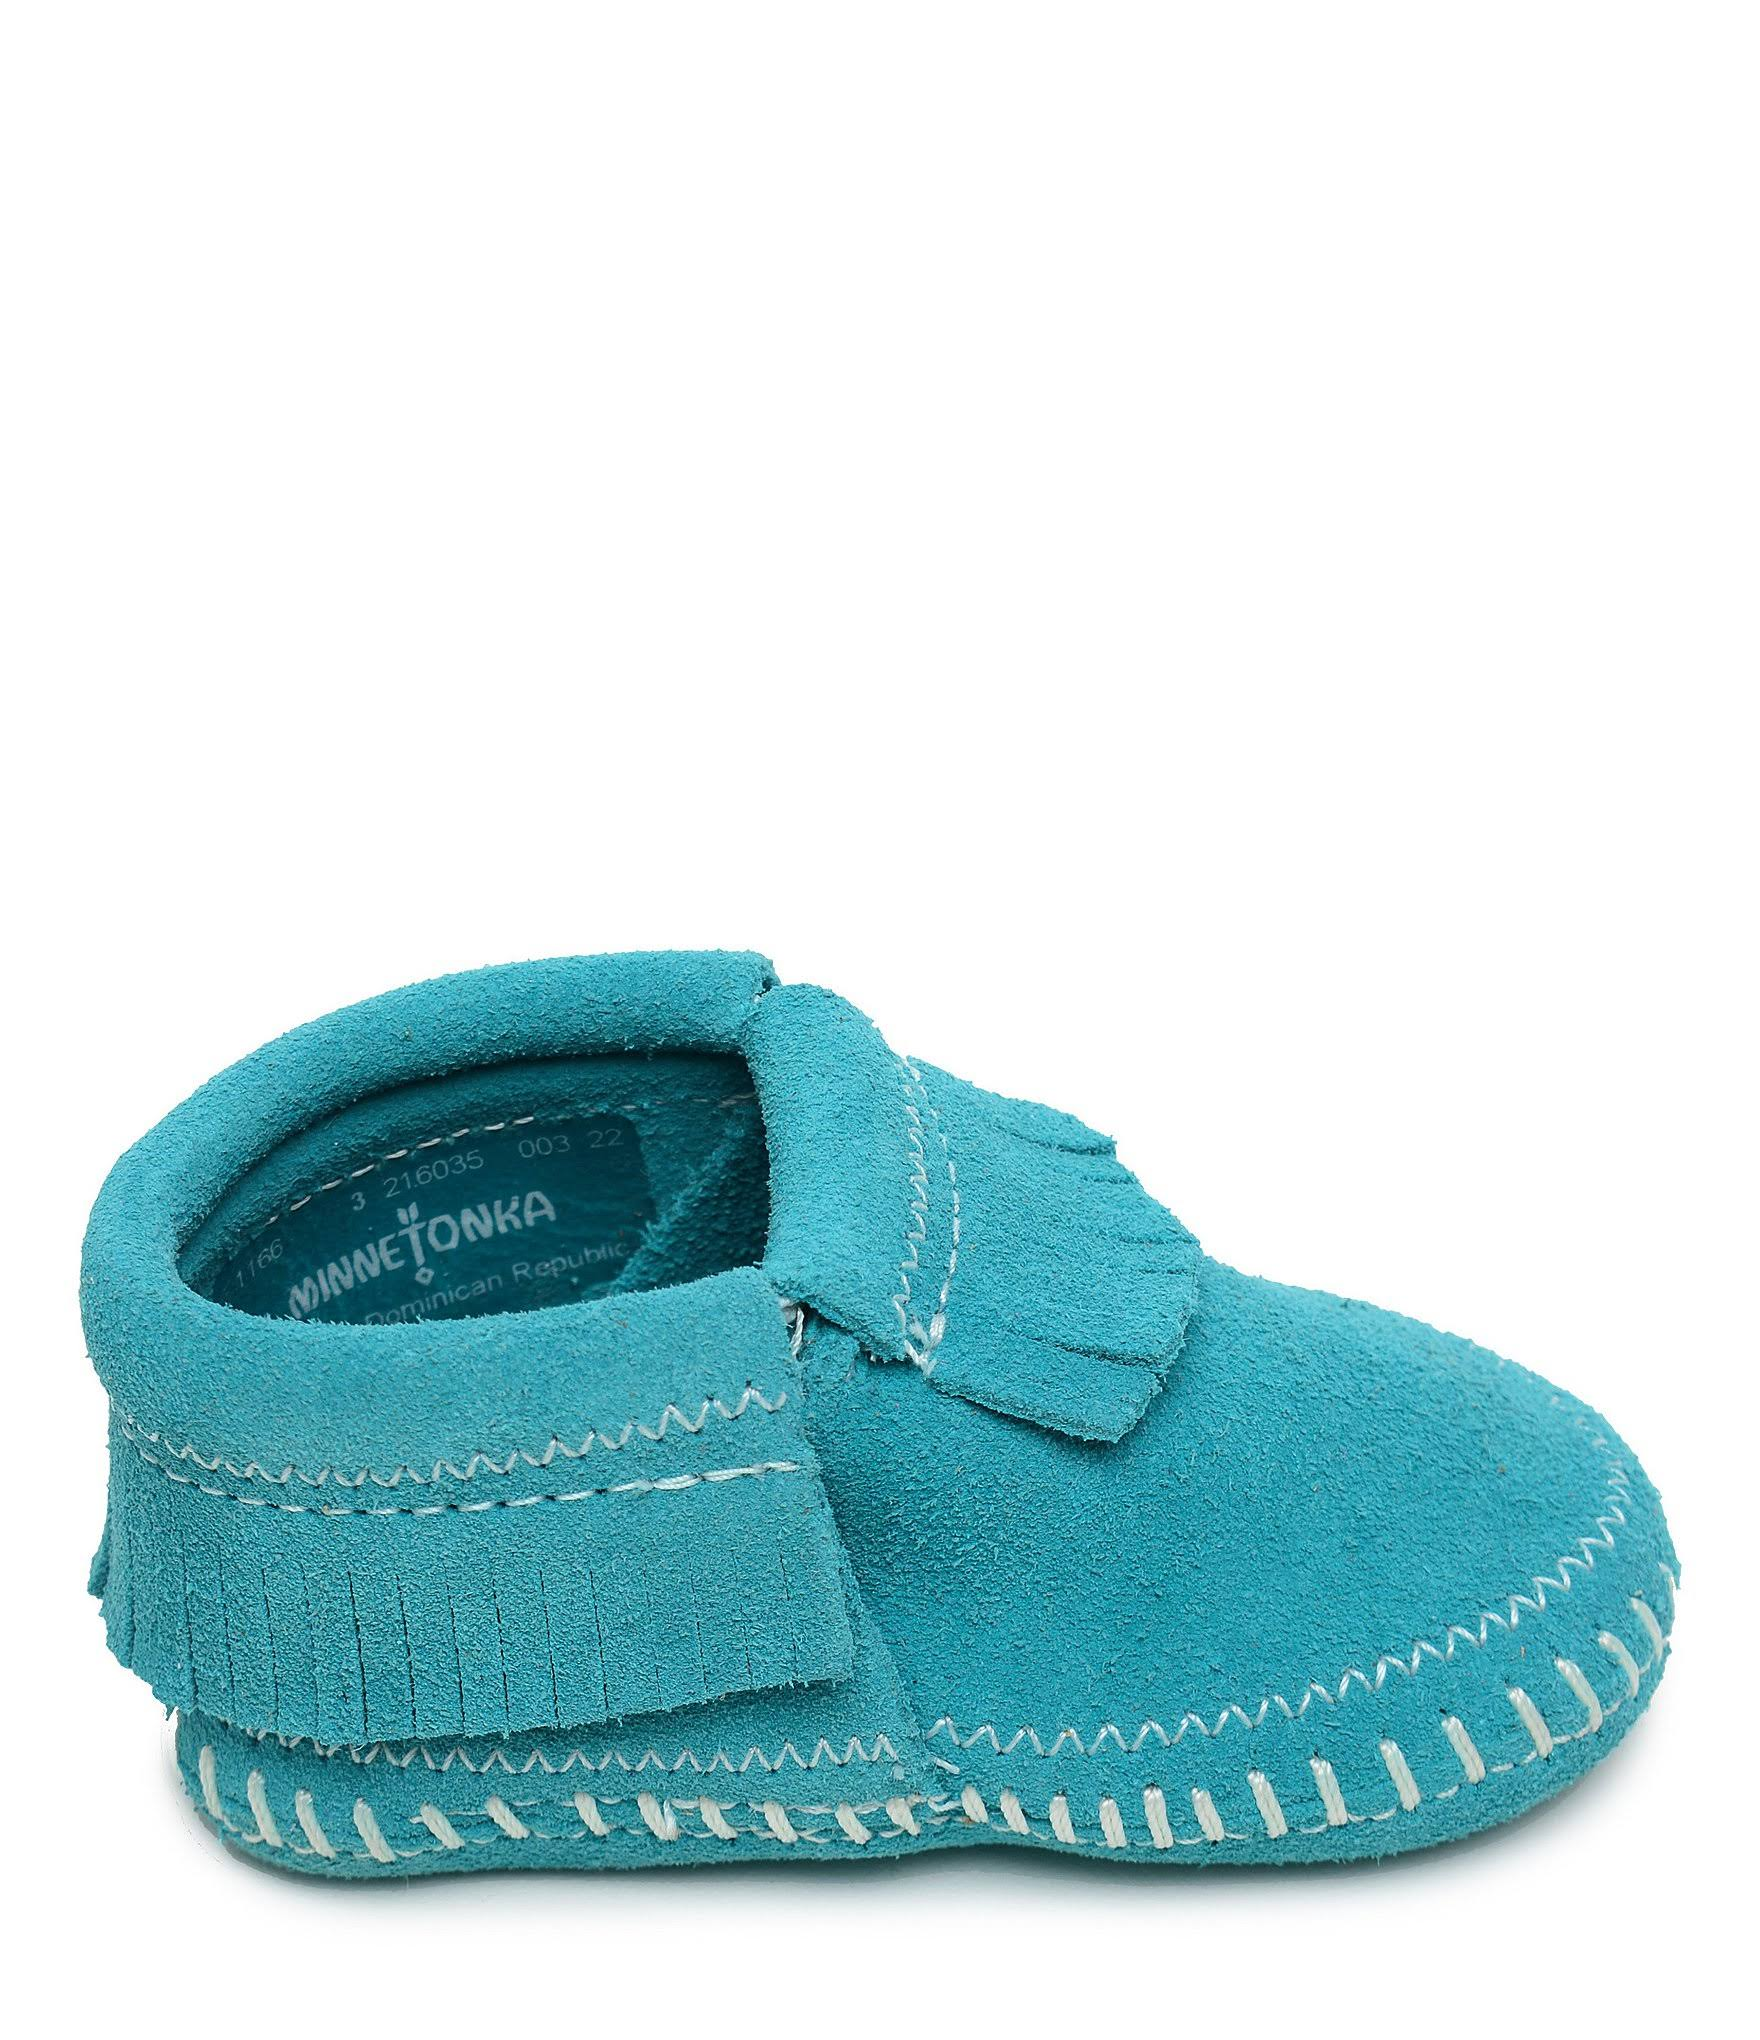 Riley Minnetonka Niñas Bota Bebés Azul 3 Mediana ZwpUf